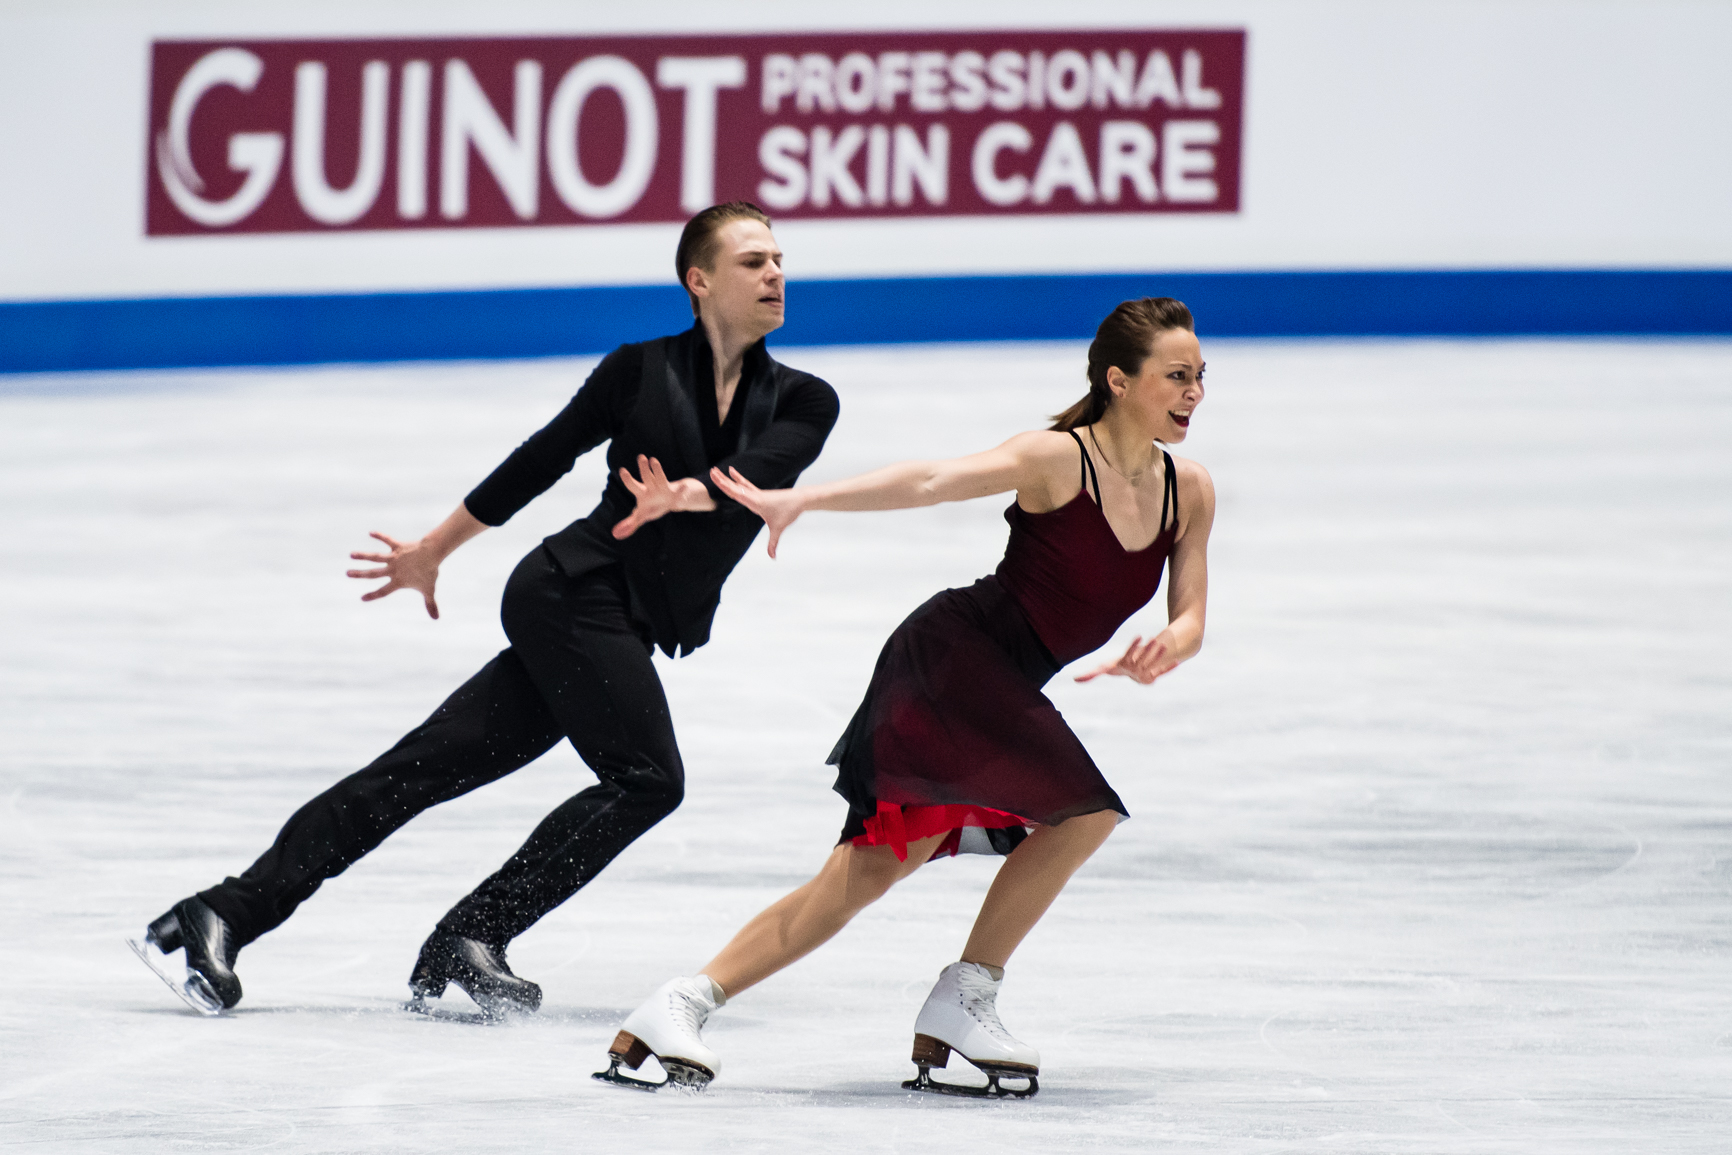 ST9_2756 - Allison ir Saulius (March 21)